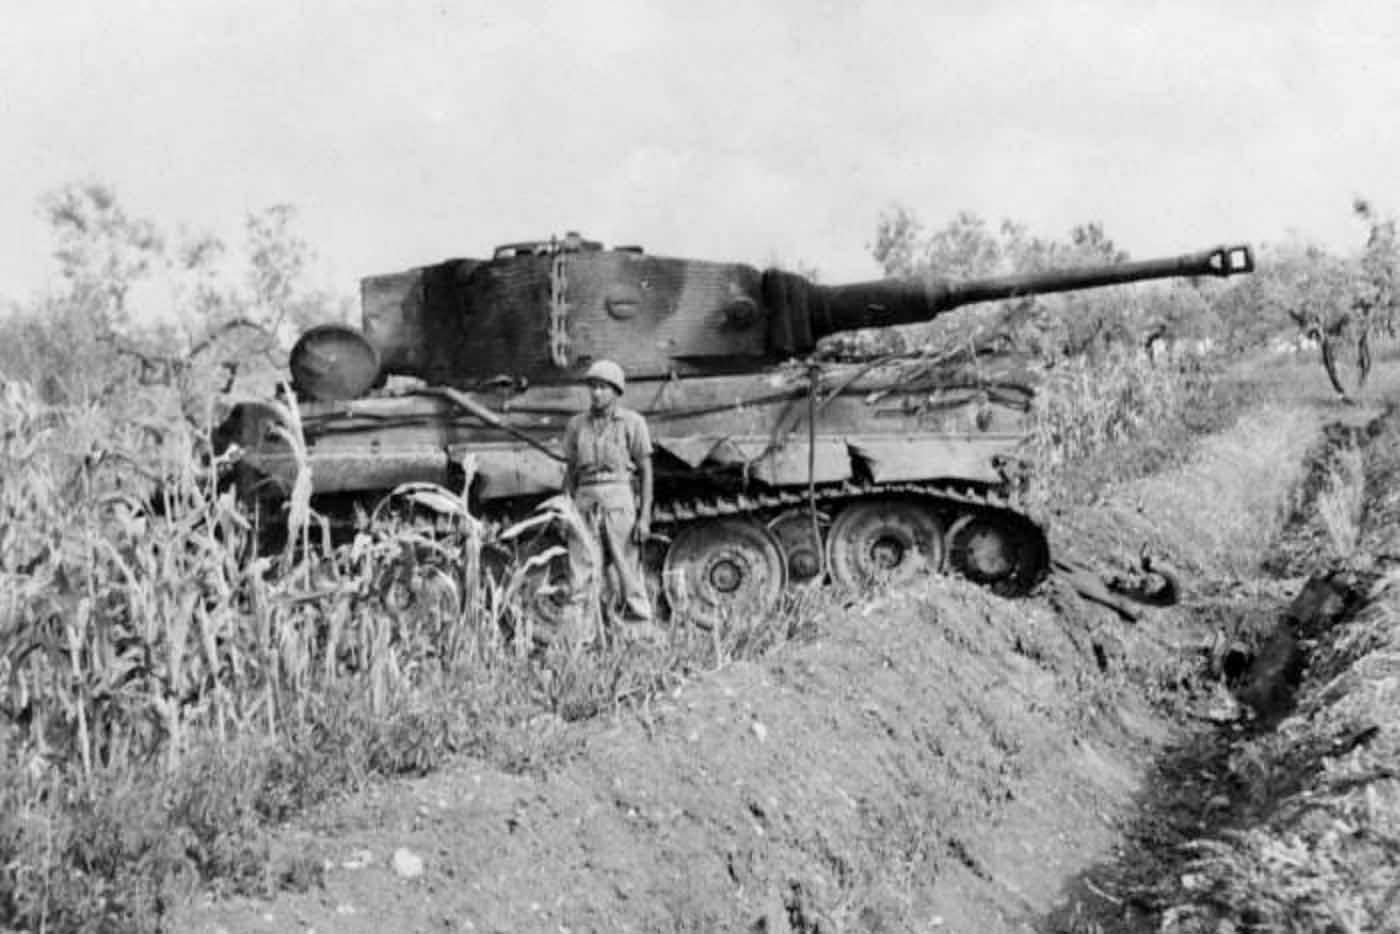 Tiger tank of the Schwere Panzer Abteilung 508, Villa Bonnaza Italy